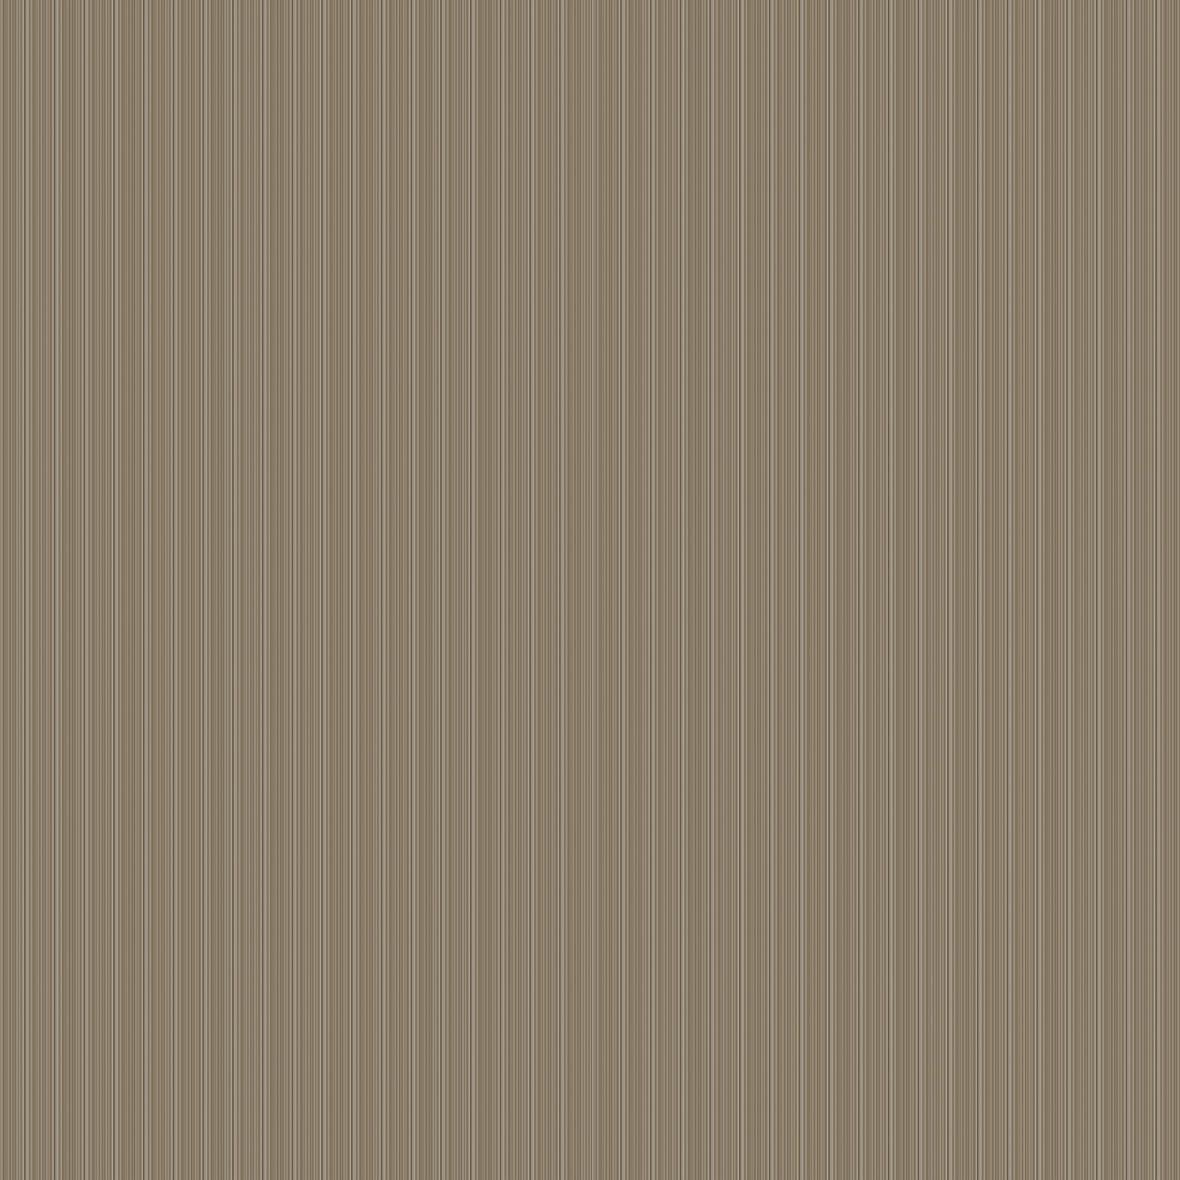 Papel de Parede Convencional Importado Mundi Roviski CD-8905  - Final Decor